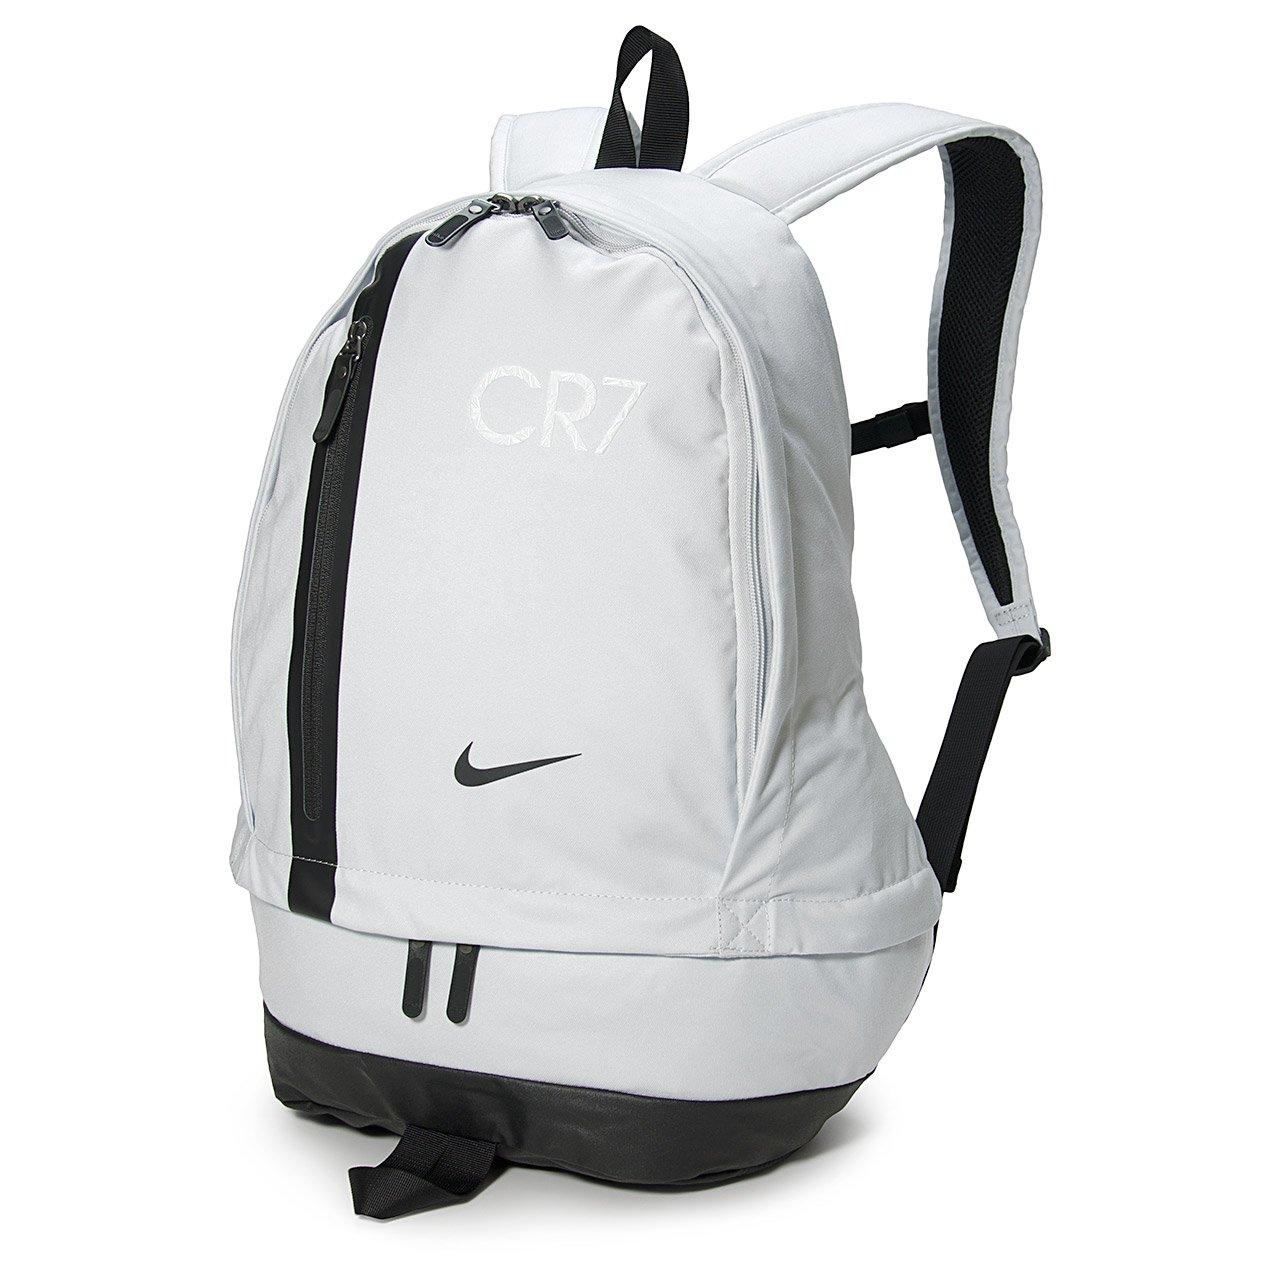 Amazon.com  Nike CR7 Cheyenne Soccer Backpack (MISC)  Clothing add38c141c25b